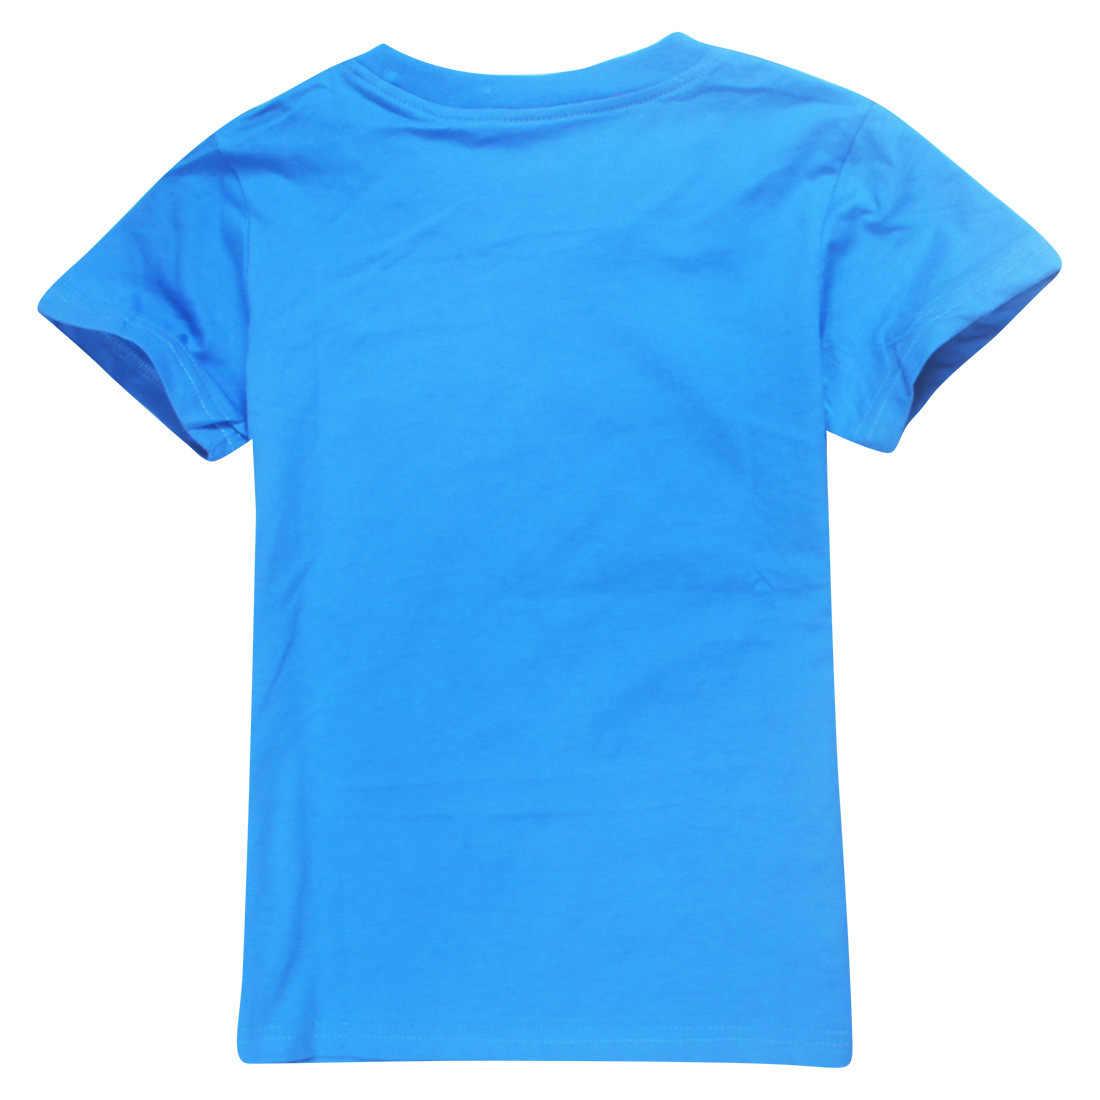 ROBLOX 어린이 의류 유아 소년 만화 복장 아기 소녀 여름 티셔츠 정장 2-16 년 어린이 의류 티셔츠 + 반바지 4pcs